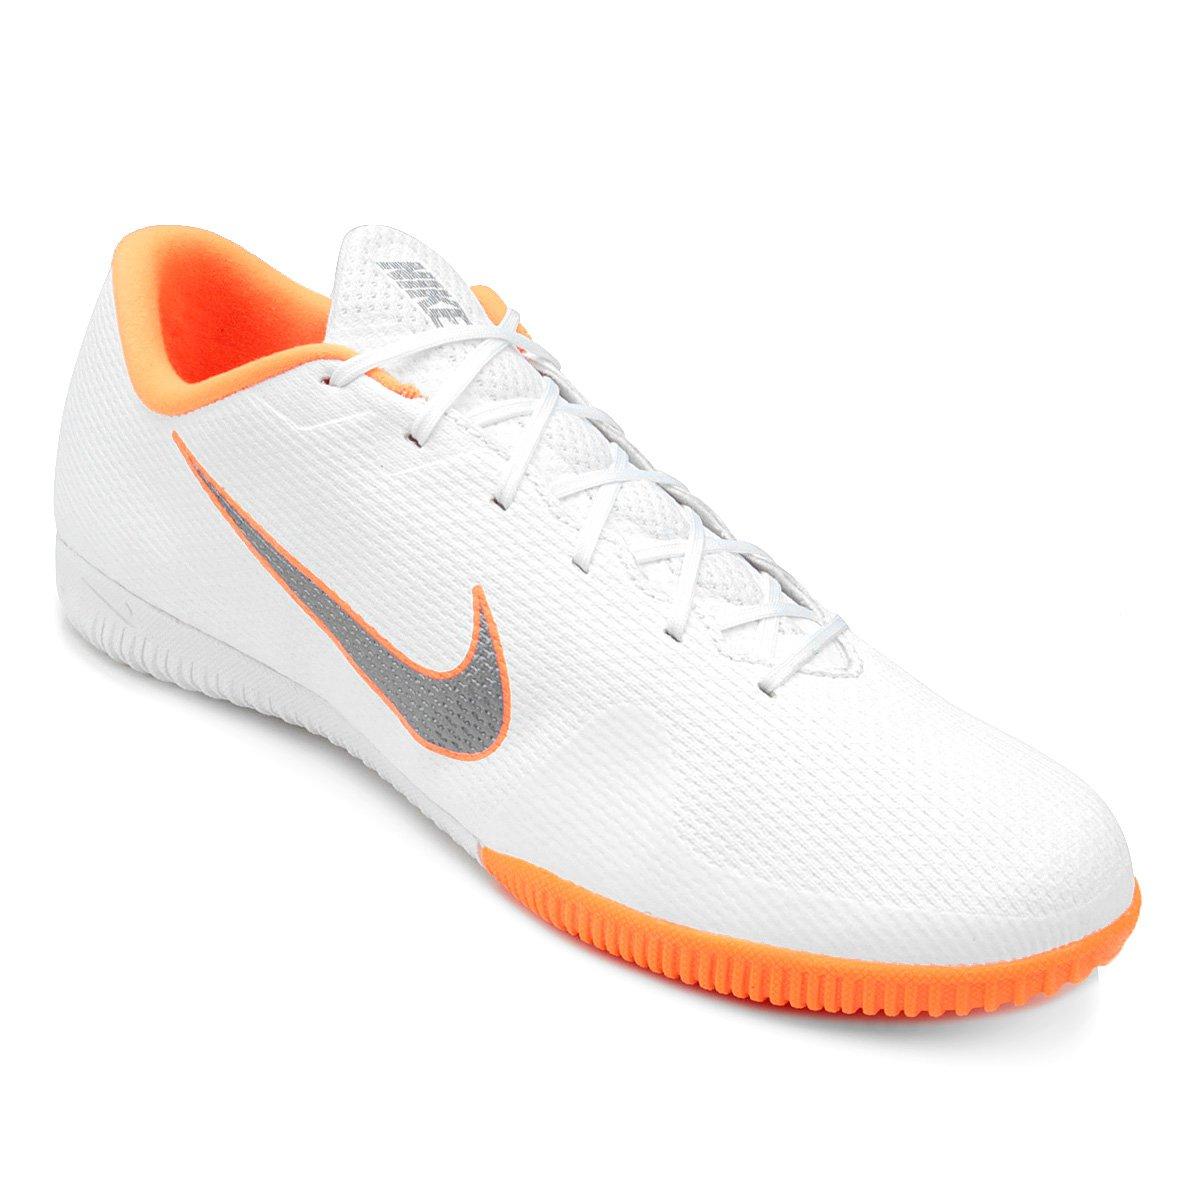 0fb0f8e9ce2d8 Chuteira Futsal Nike Mercurial Vapor 12 Academy Masculina. undefined